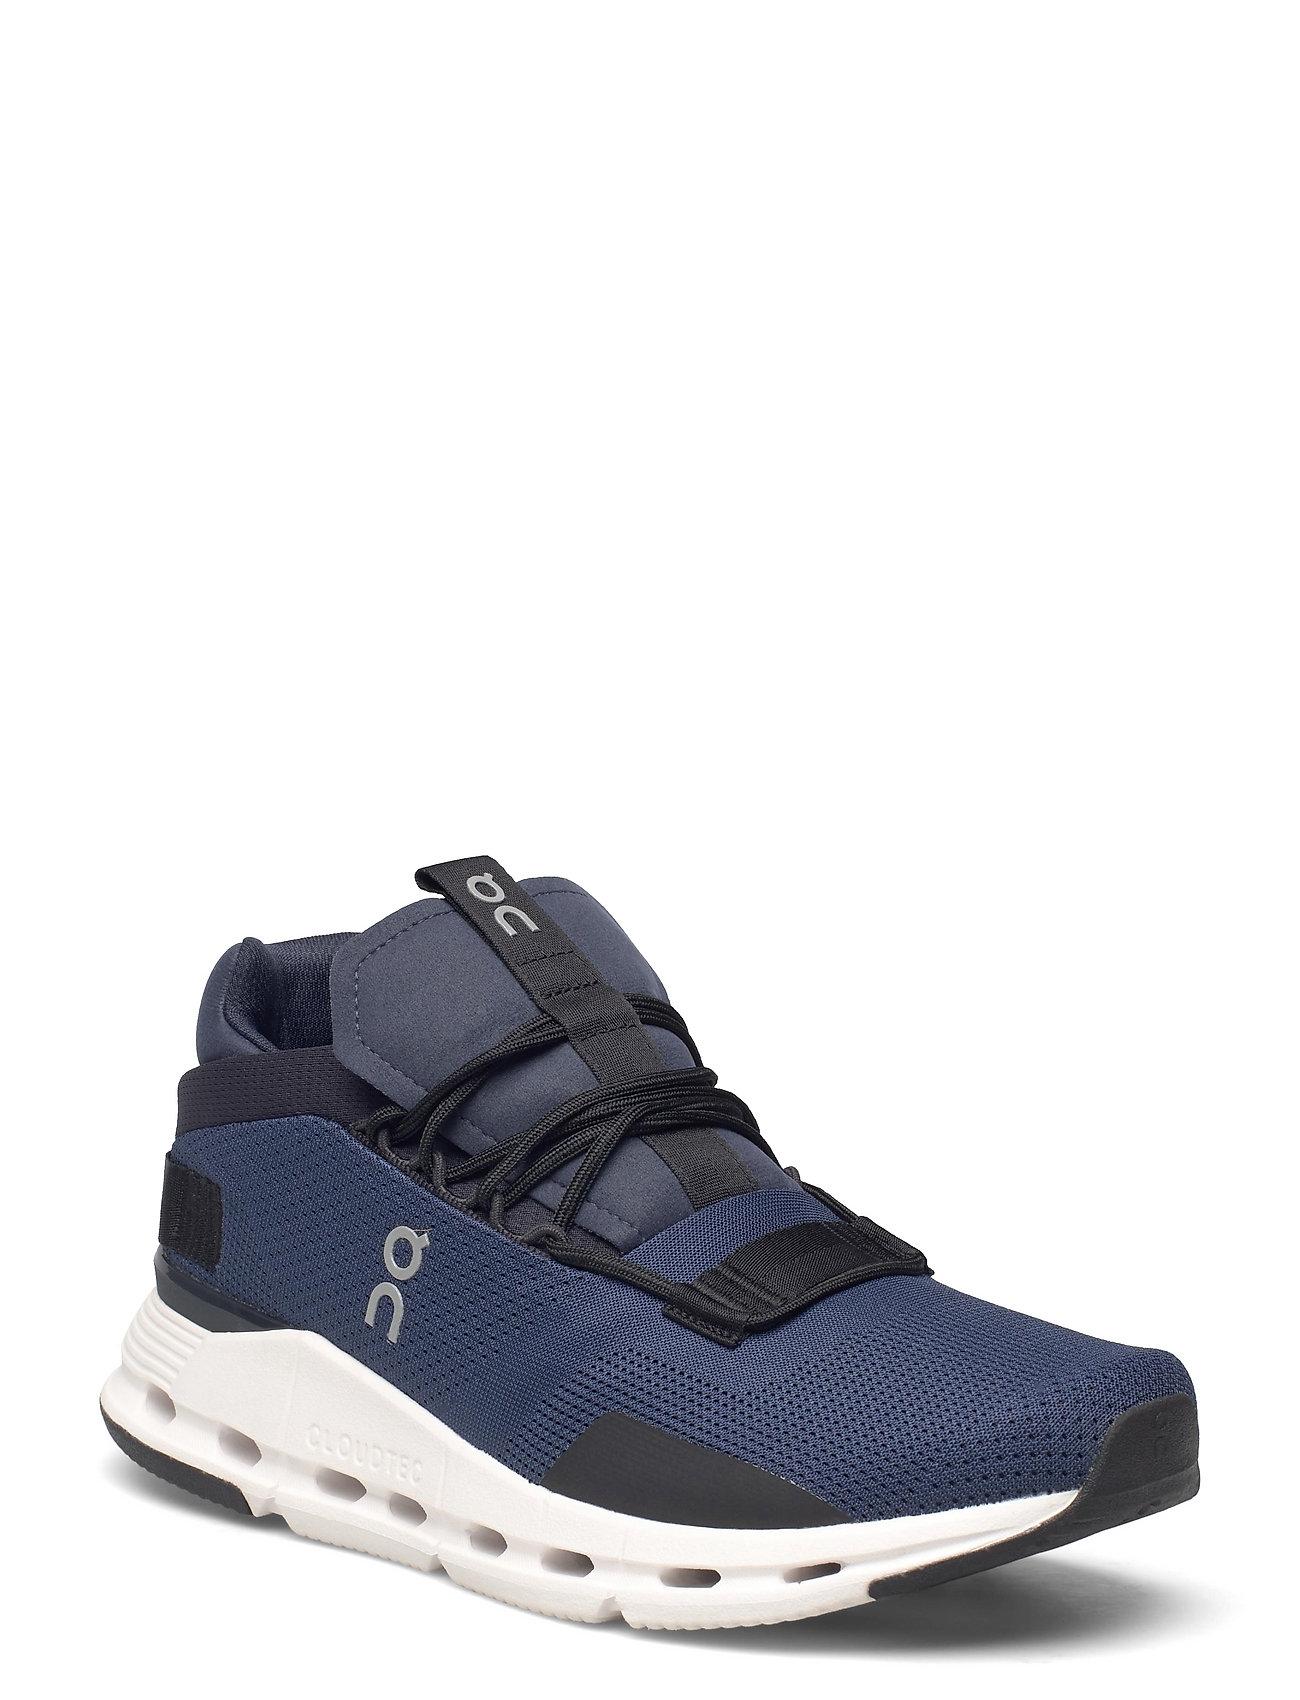 Cloudnova Low-top Sneakers Blå On